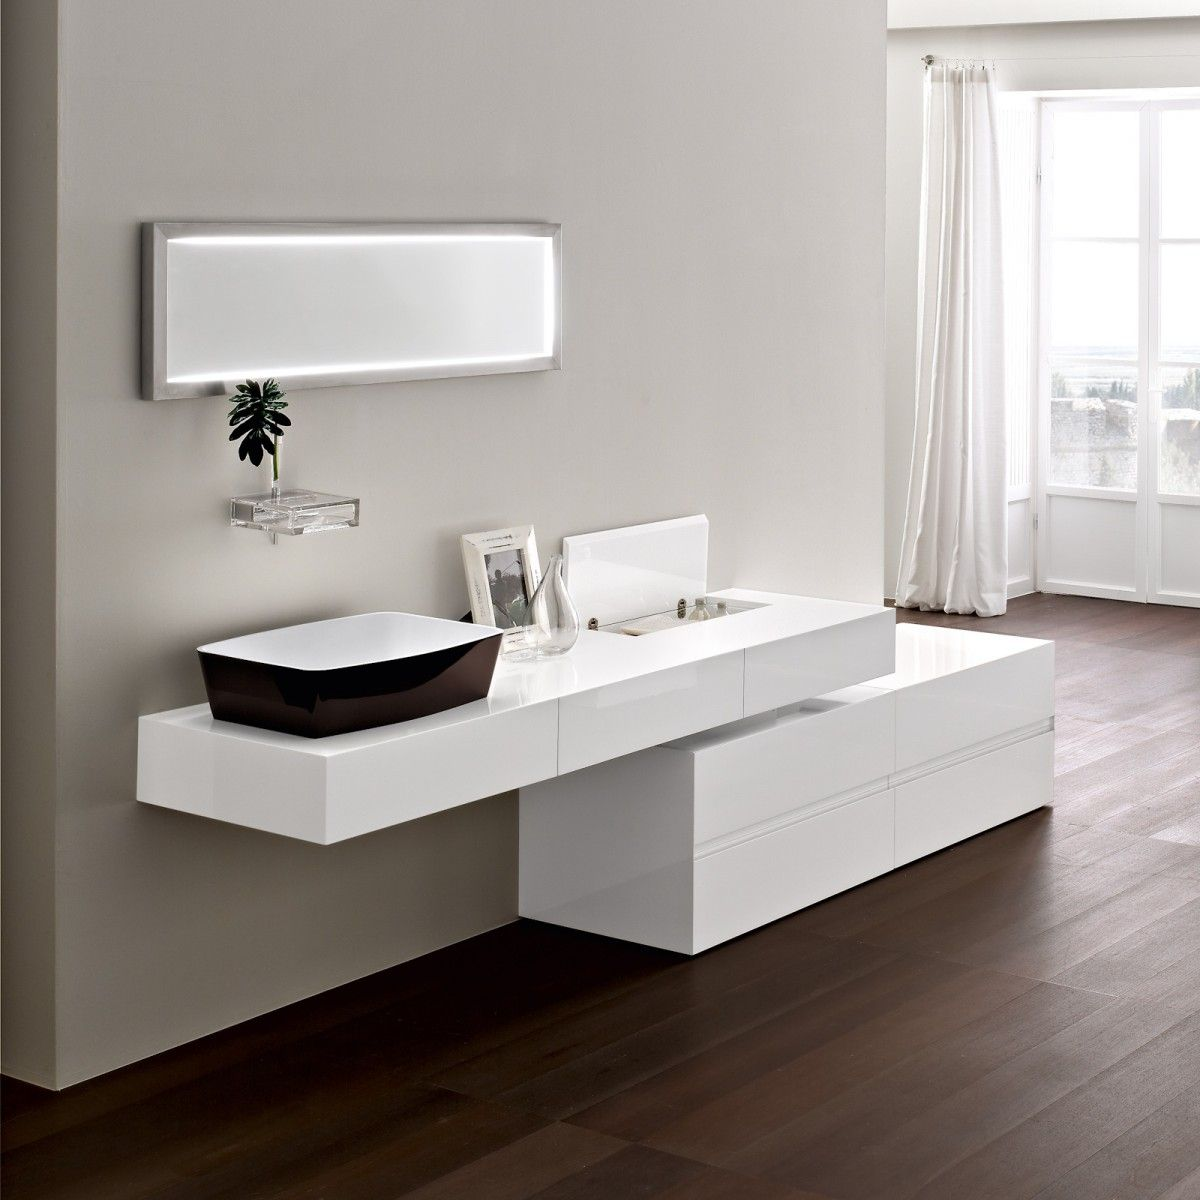 pin de paula calella en toilette | pinterest | cuarto de baño